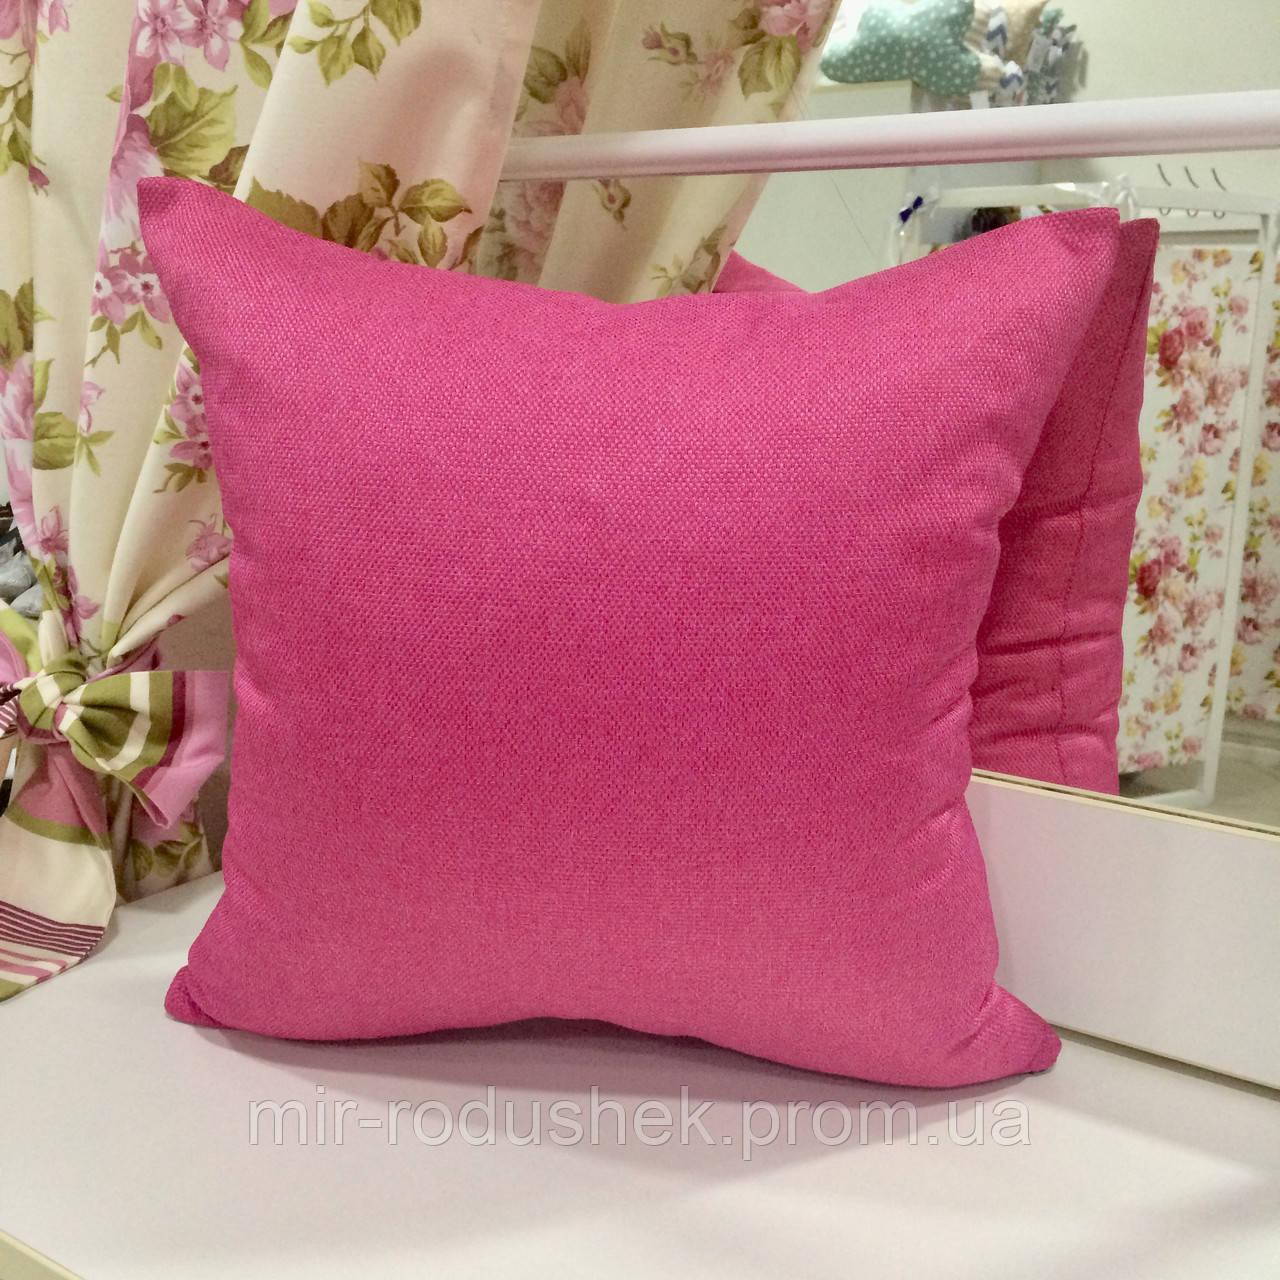 "Декоративная подушка ""Рогожка Брук"" 45х45 розовая: наволочка на молнии, наполнитель холлофайбер"